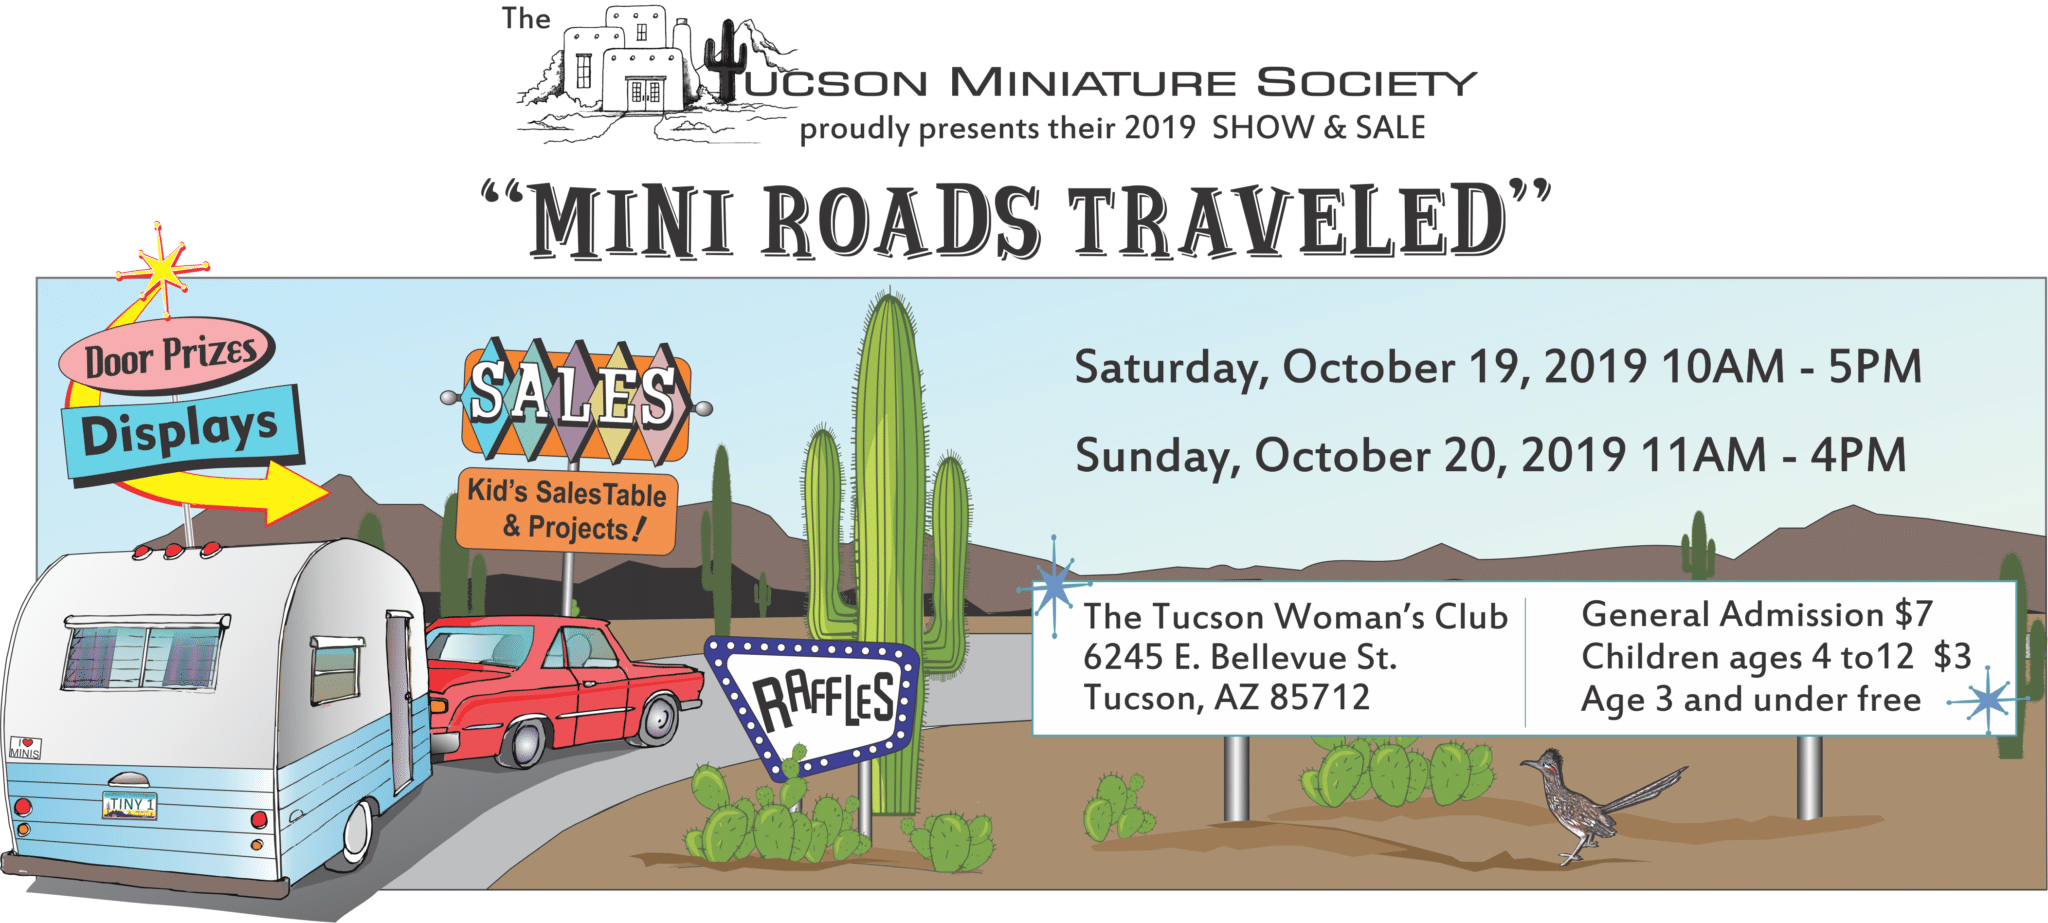 Tucson Miniature Society Show & Sale